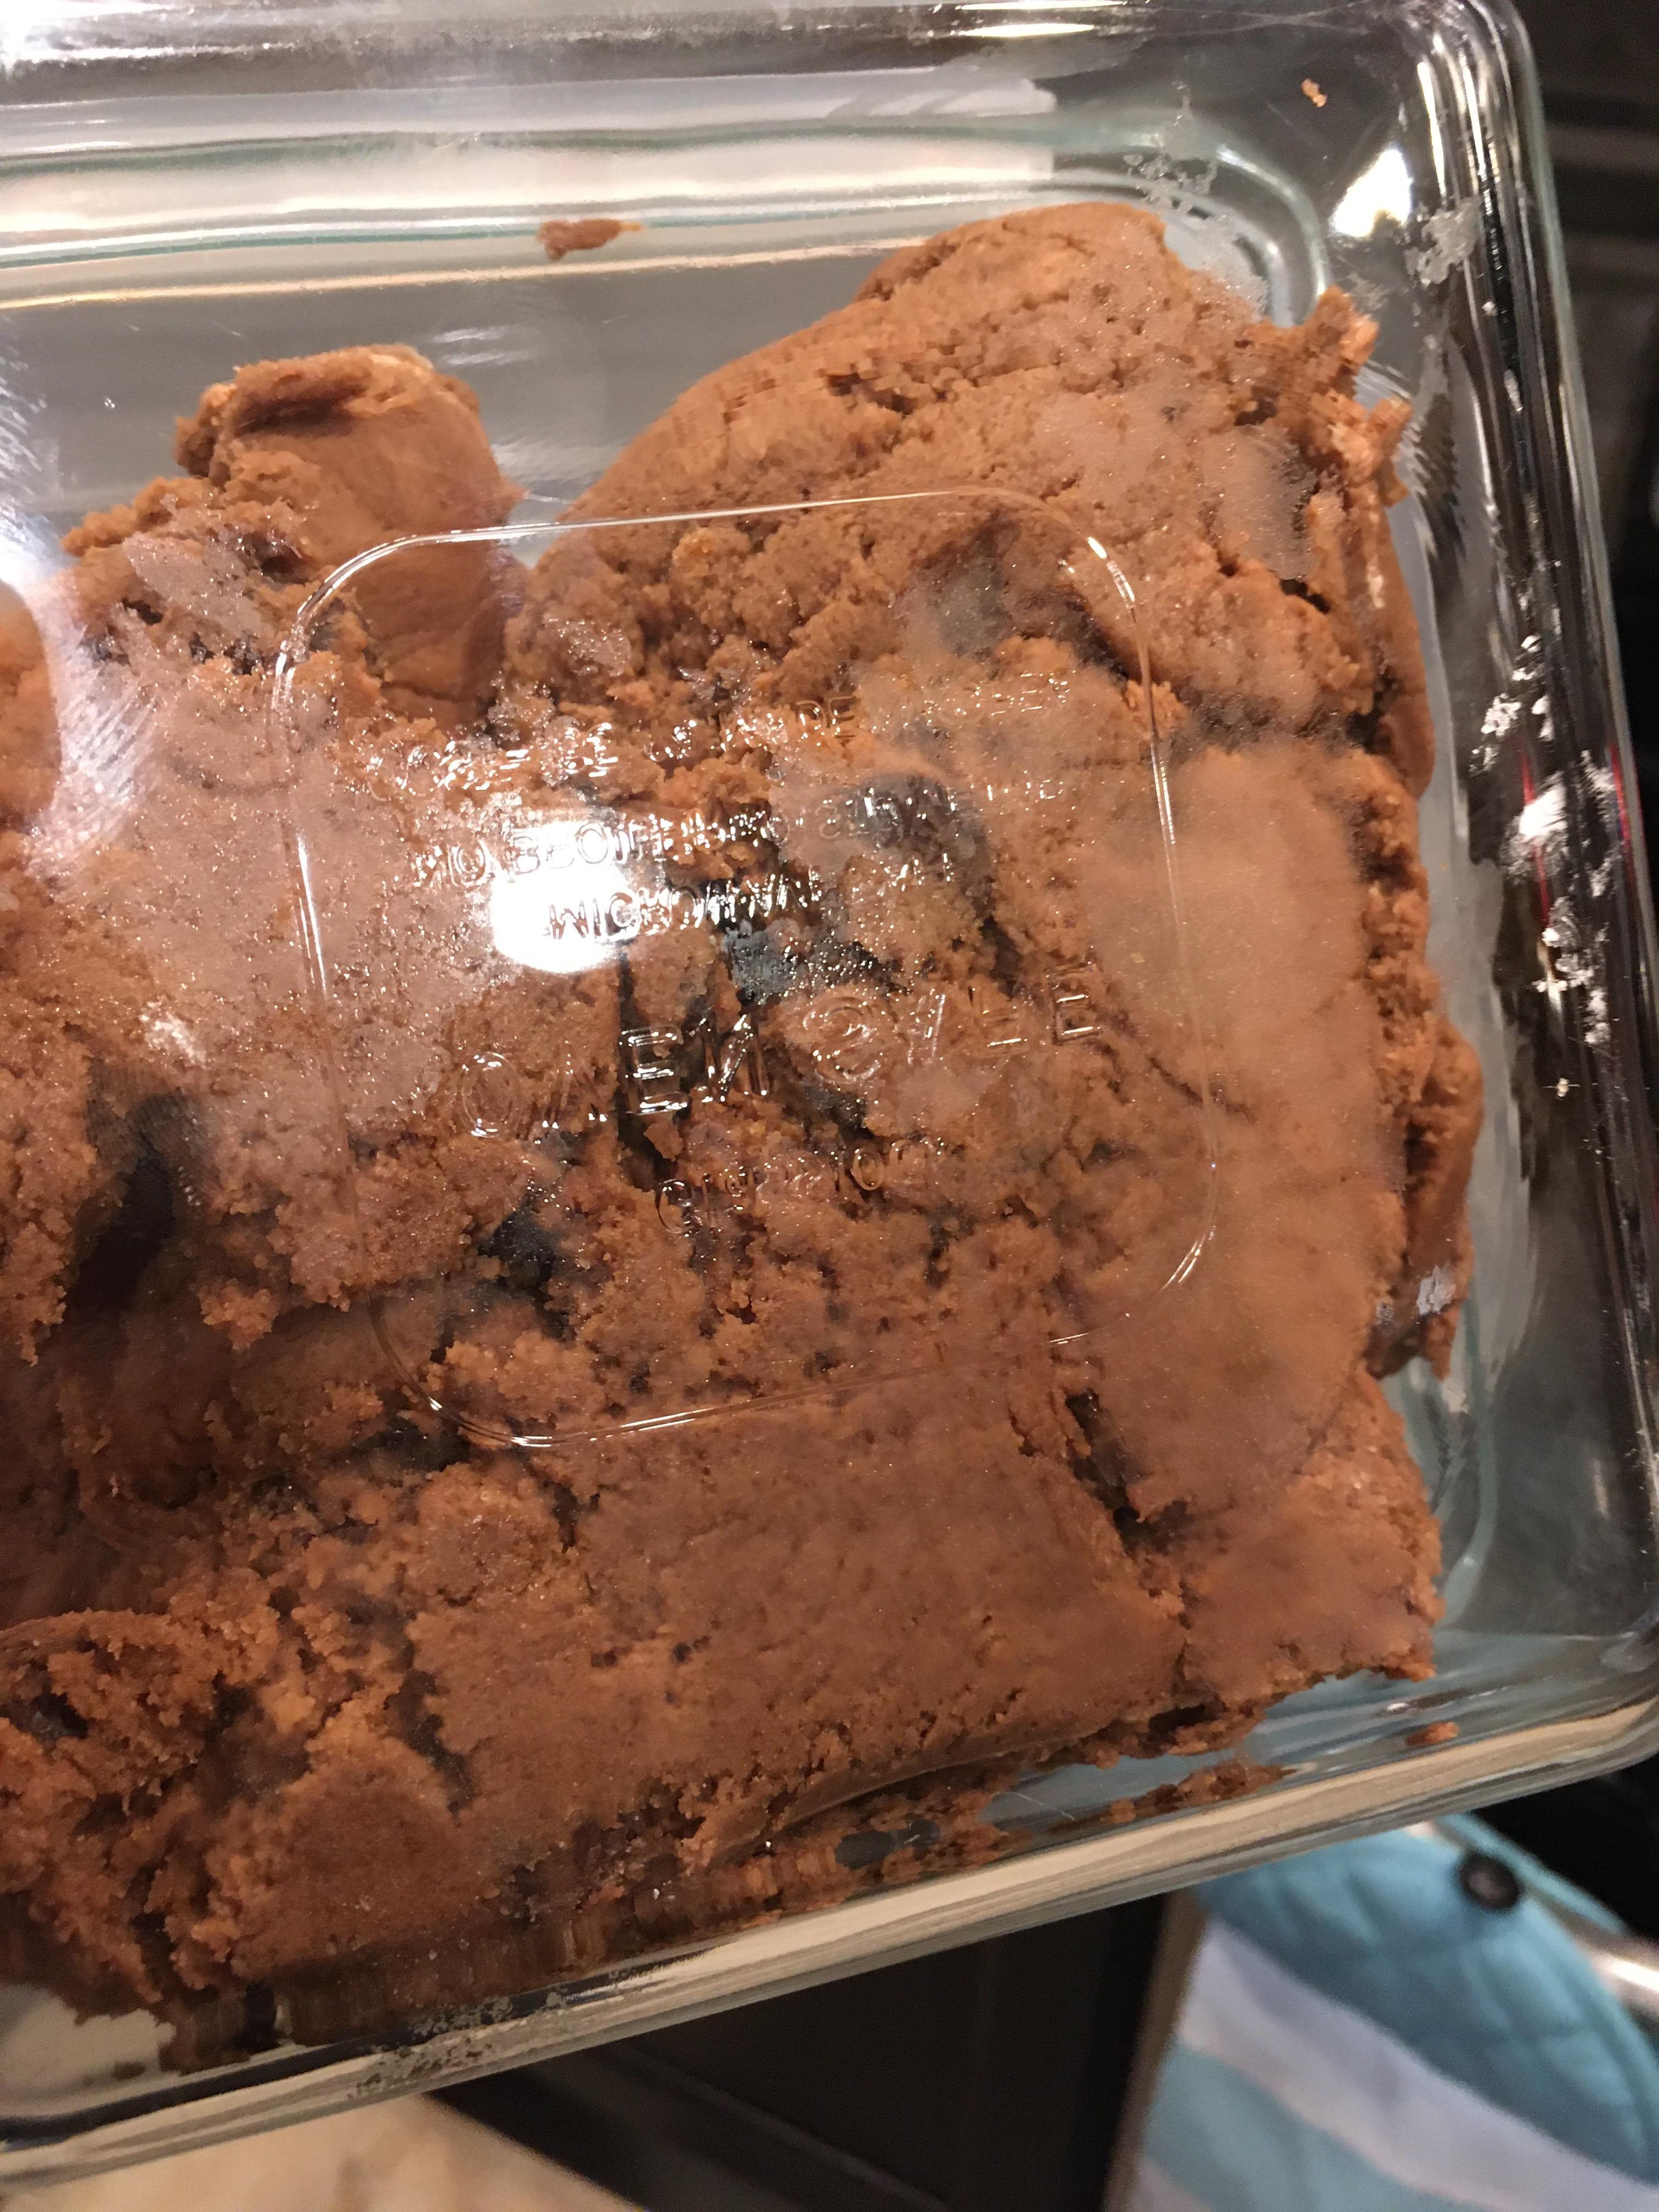 Strawberry Truffle Chocolate Cookies